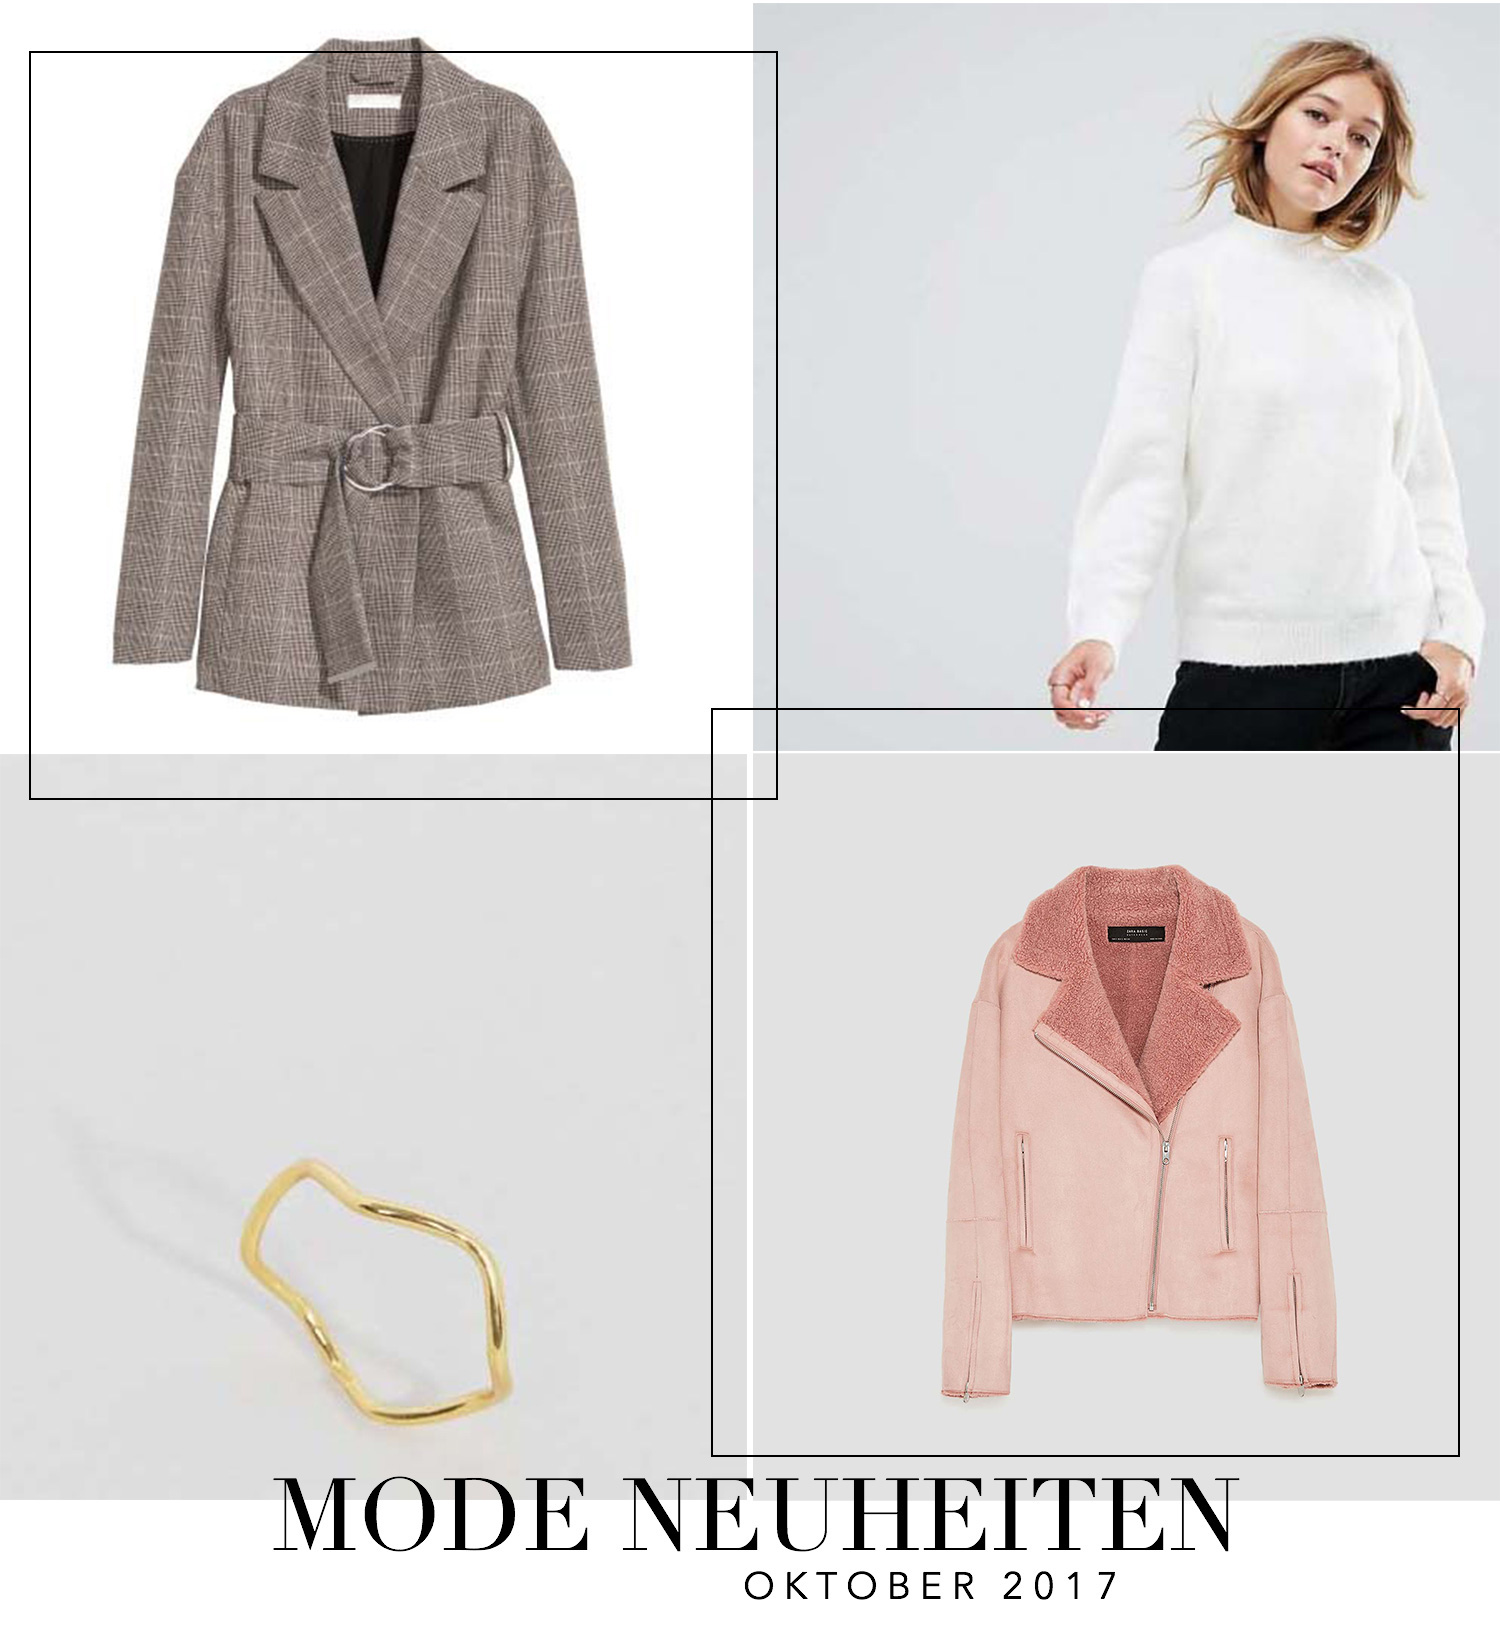 Oktober Favoriten 2017, Monatsrückblick, Mode Neuheiten, H&M Glencheck Blazer, Zara rosa Shearling Jacke, Asos weißer Pullover, Asos goldener Ring, bezauberndenana.de